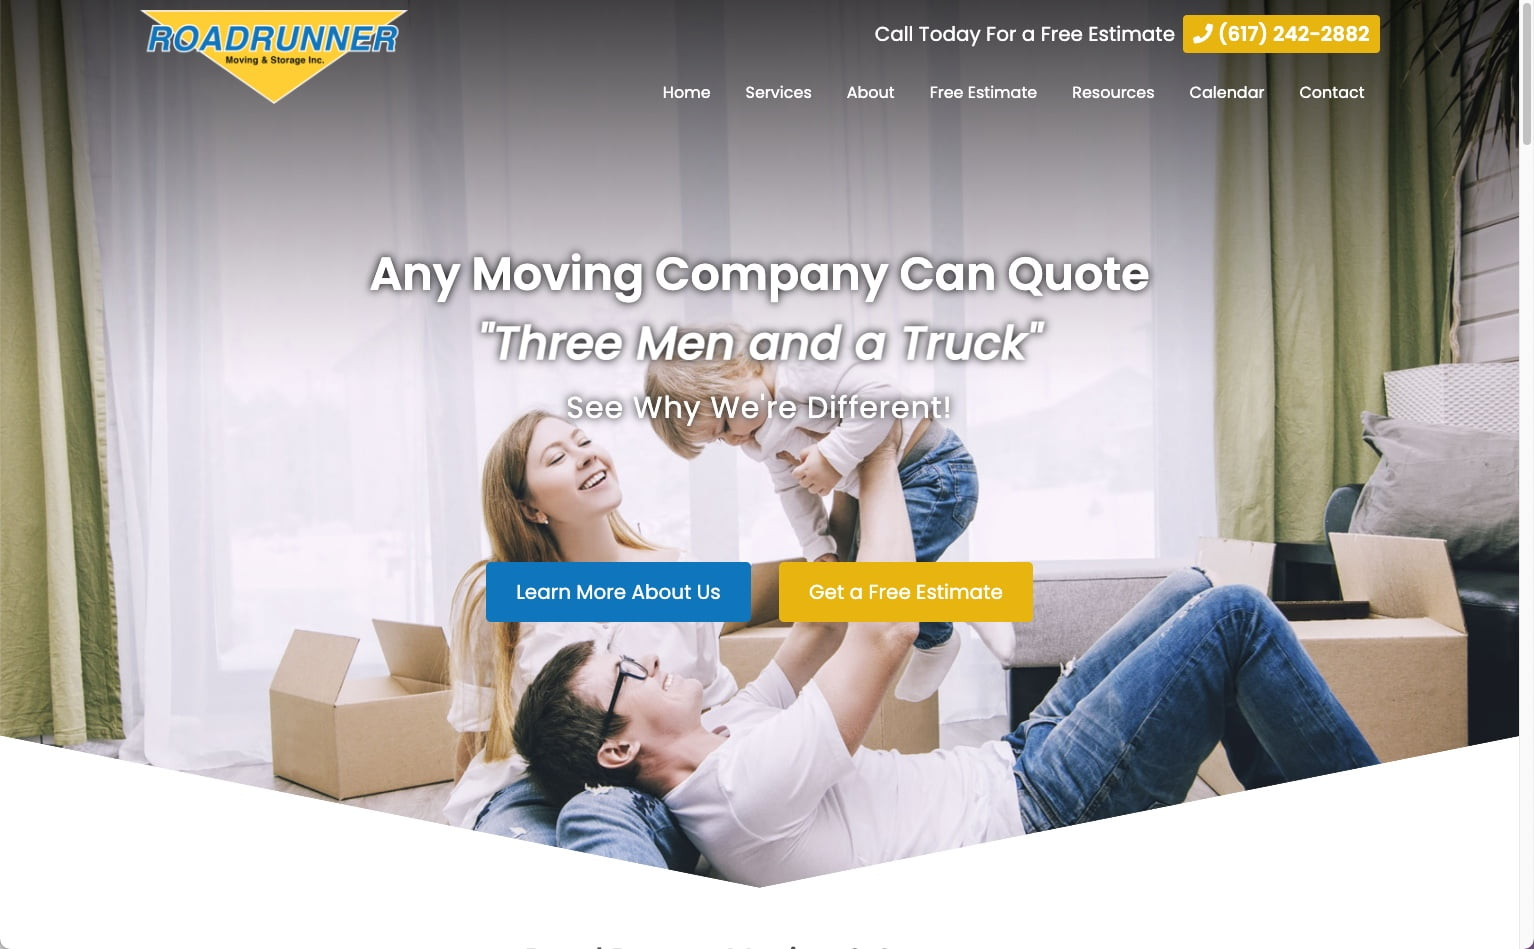 Roadrunner Moving & Storage